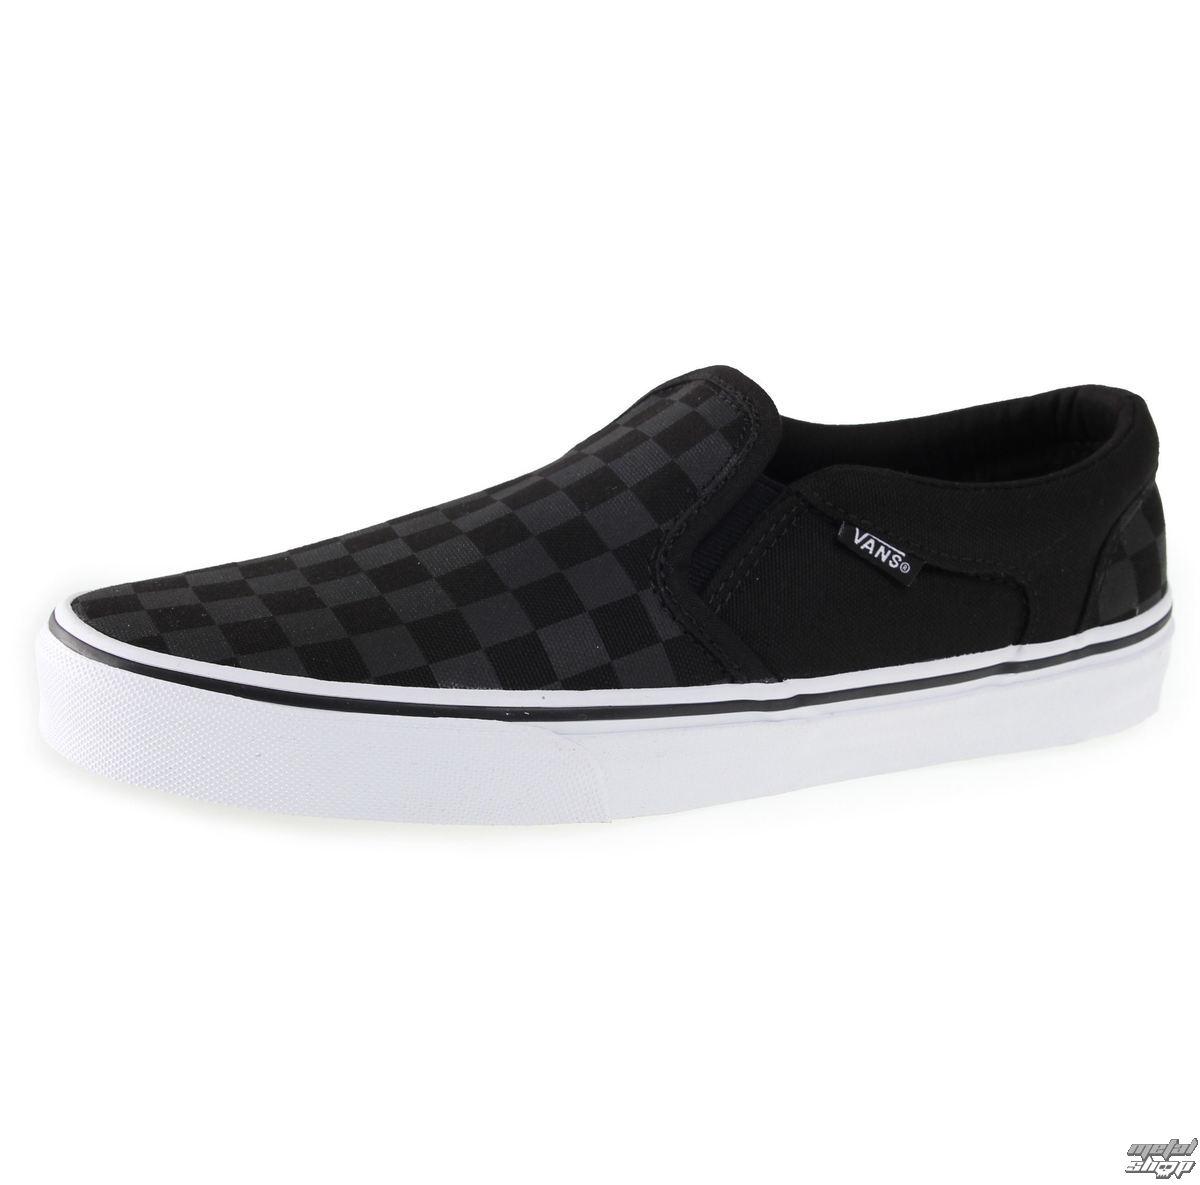 topánky pánske VANS - Aher (Chkrs) - Blk/Blk - VSEQ542